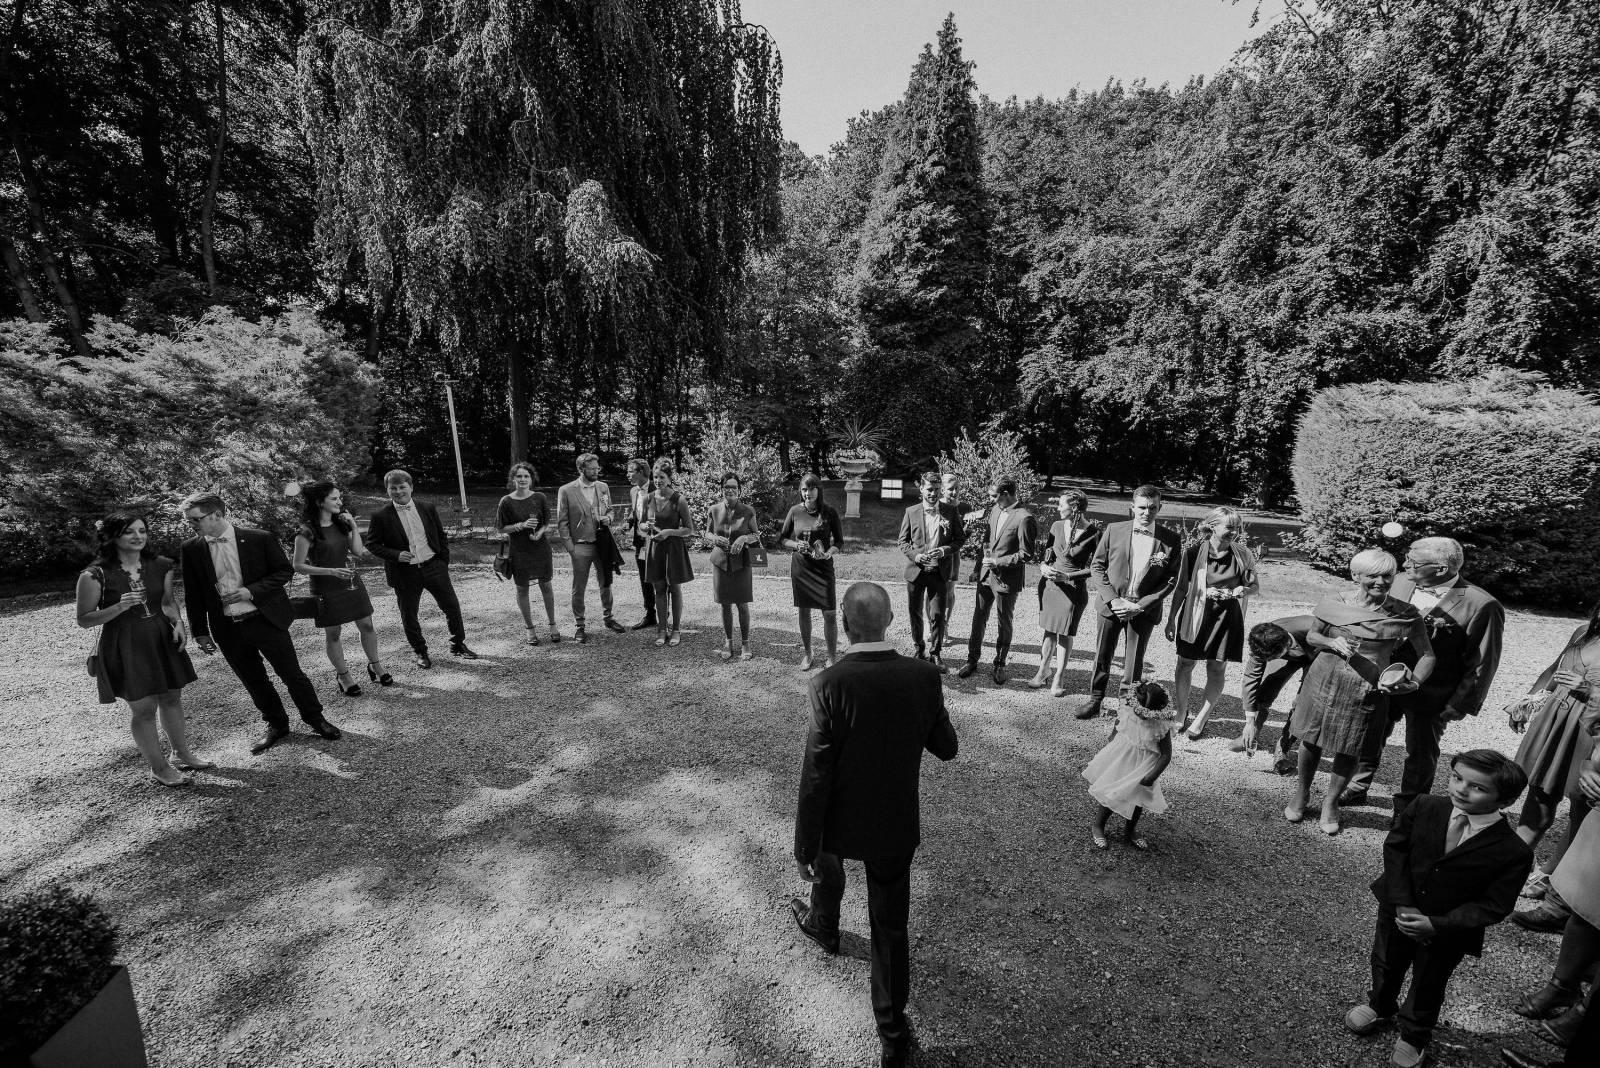 Excellence Weddings - House of Weddings - Aurélien ScArt (4)